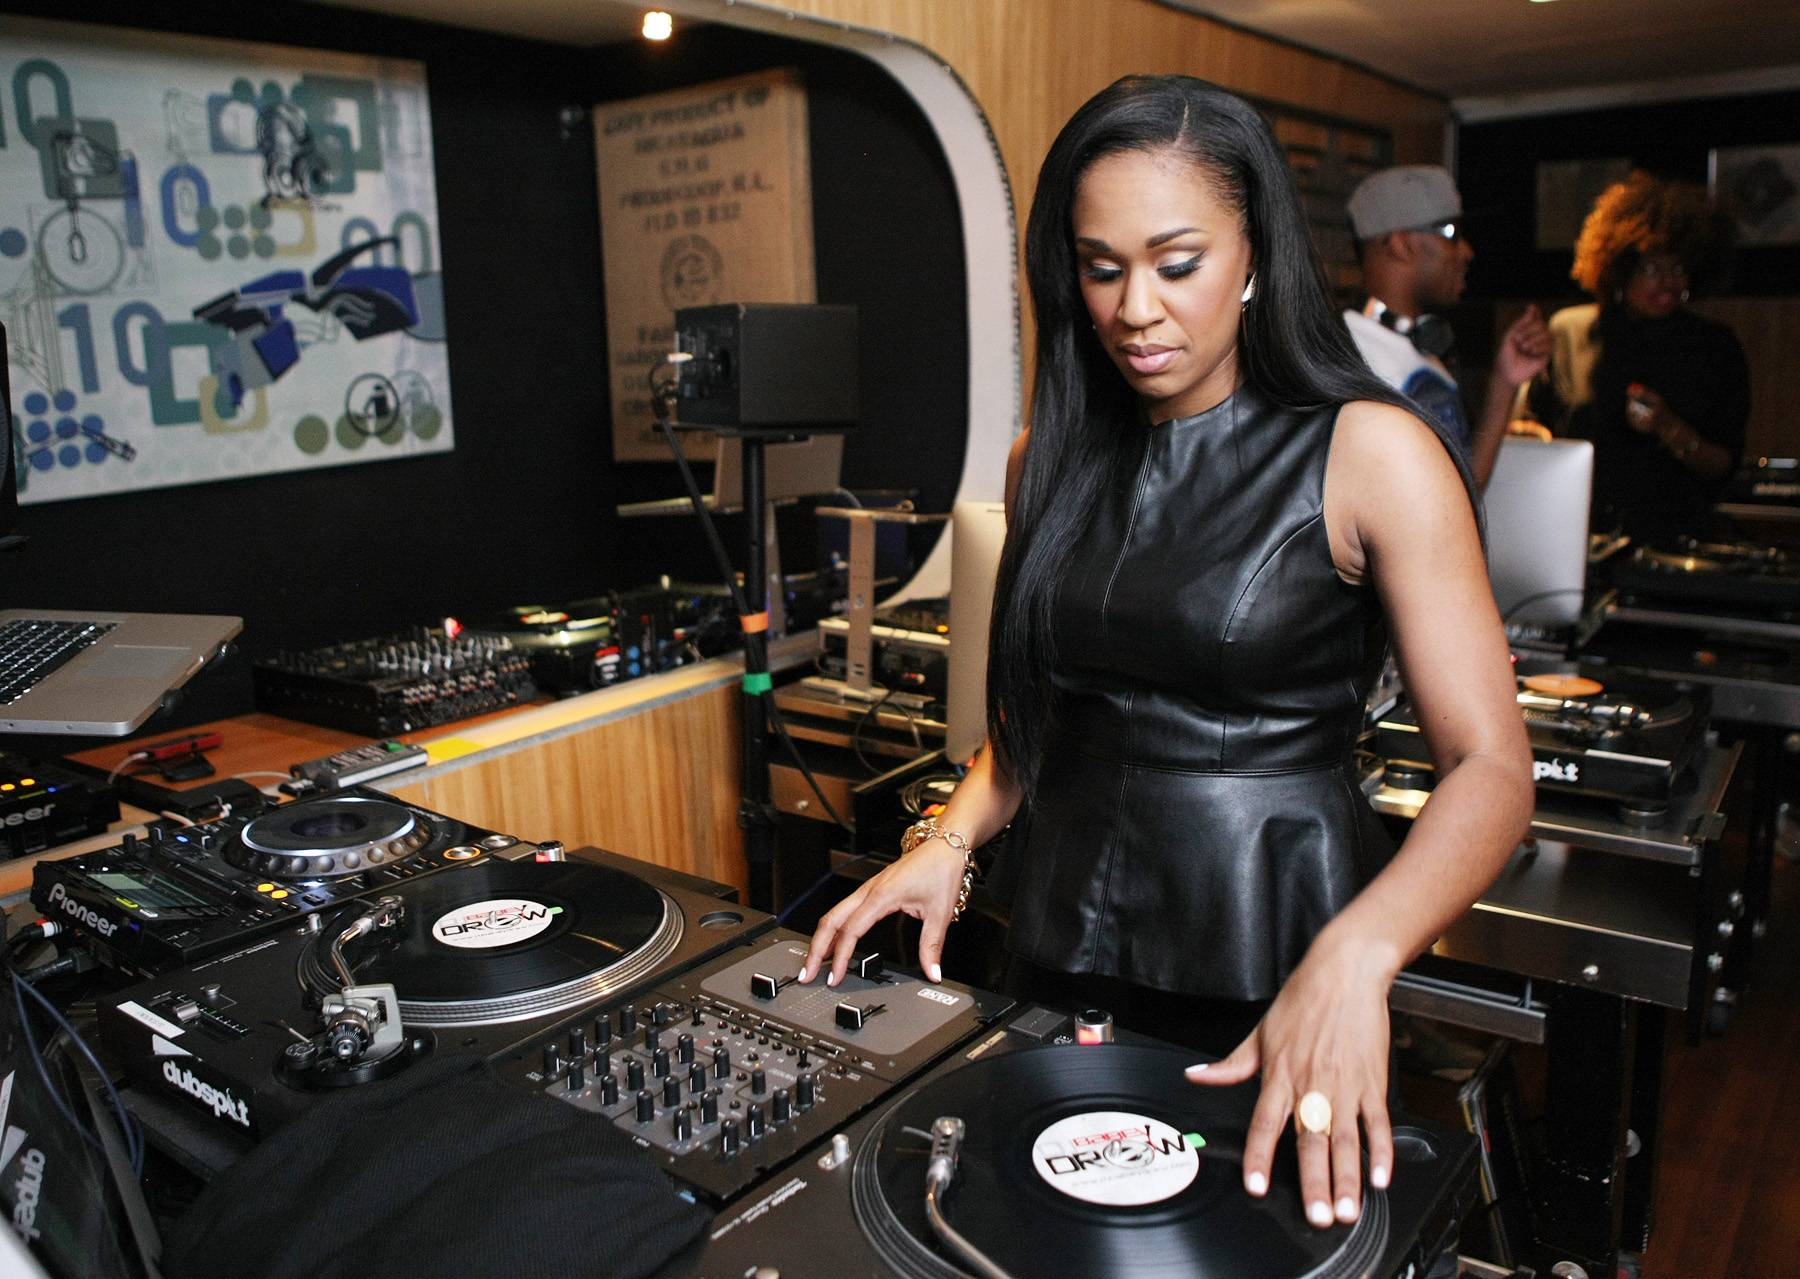 Slight Work - DJ Traci Steele hits the wax. (Photo: Bennett Raglin/BET/Getty Images for BET)